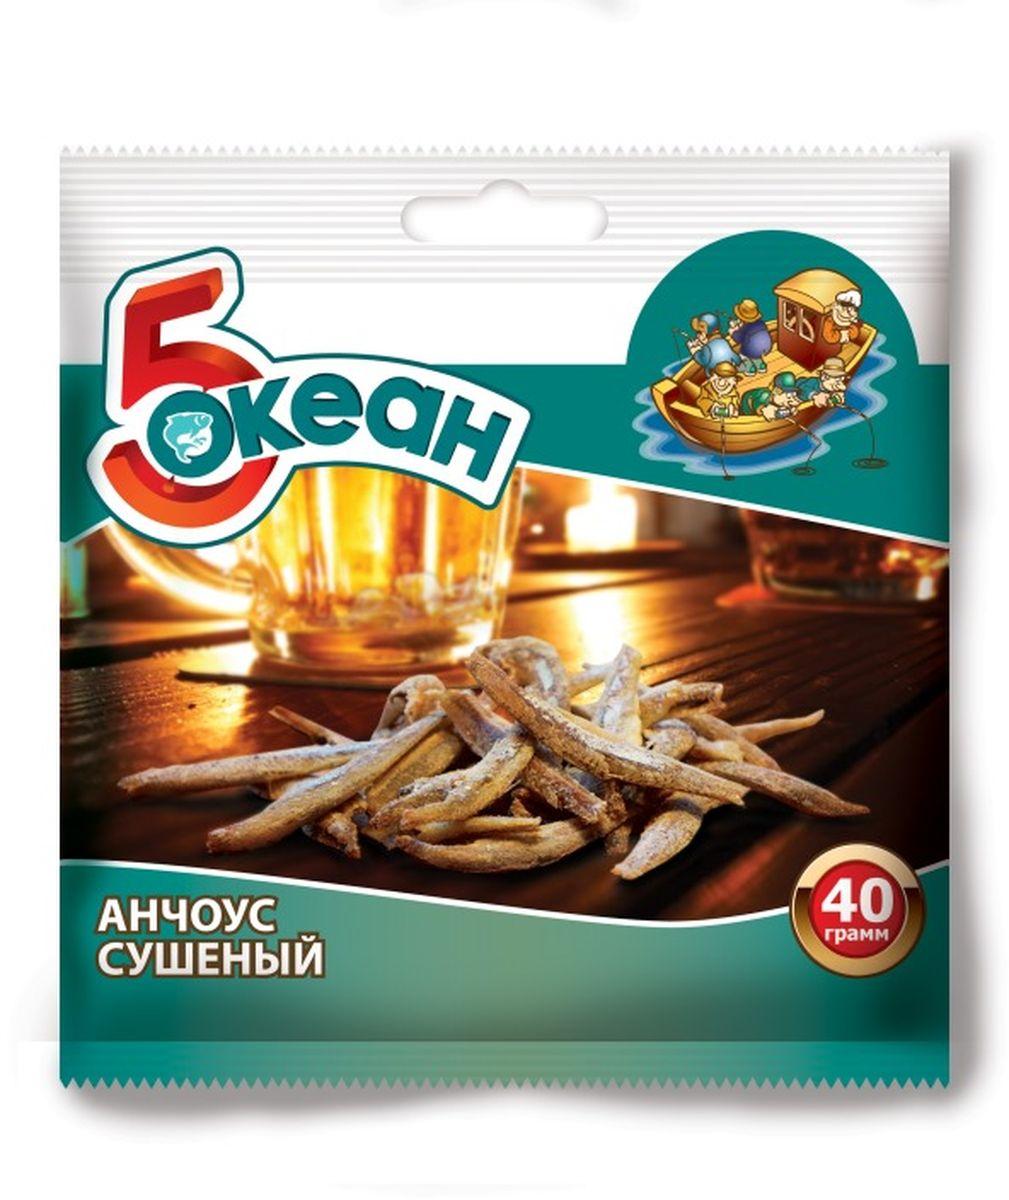 5 Океан анчоус, 40 г